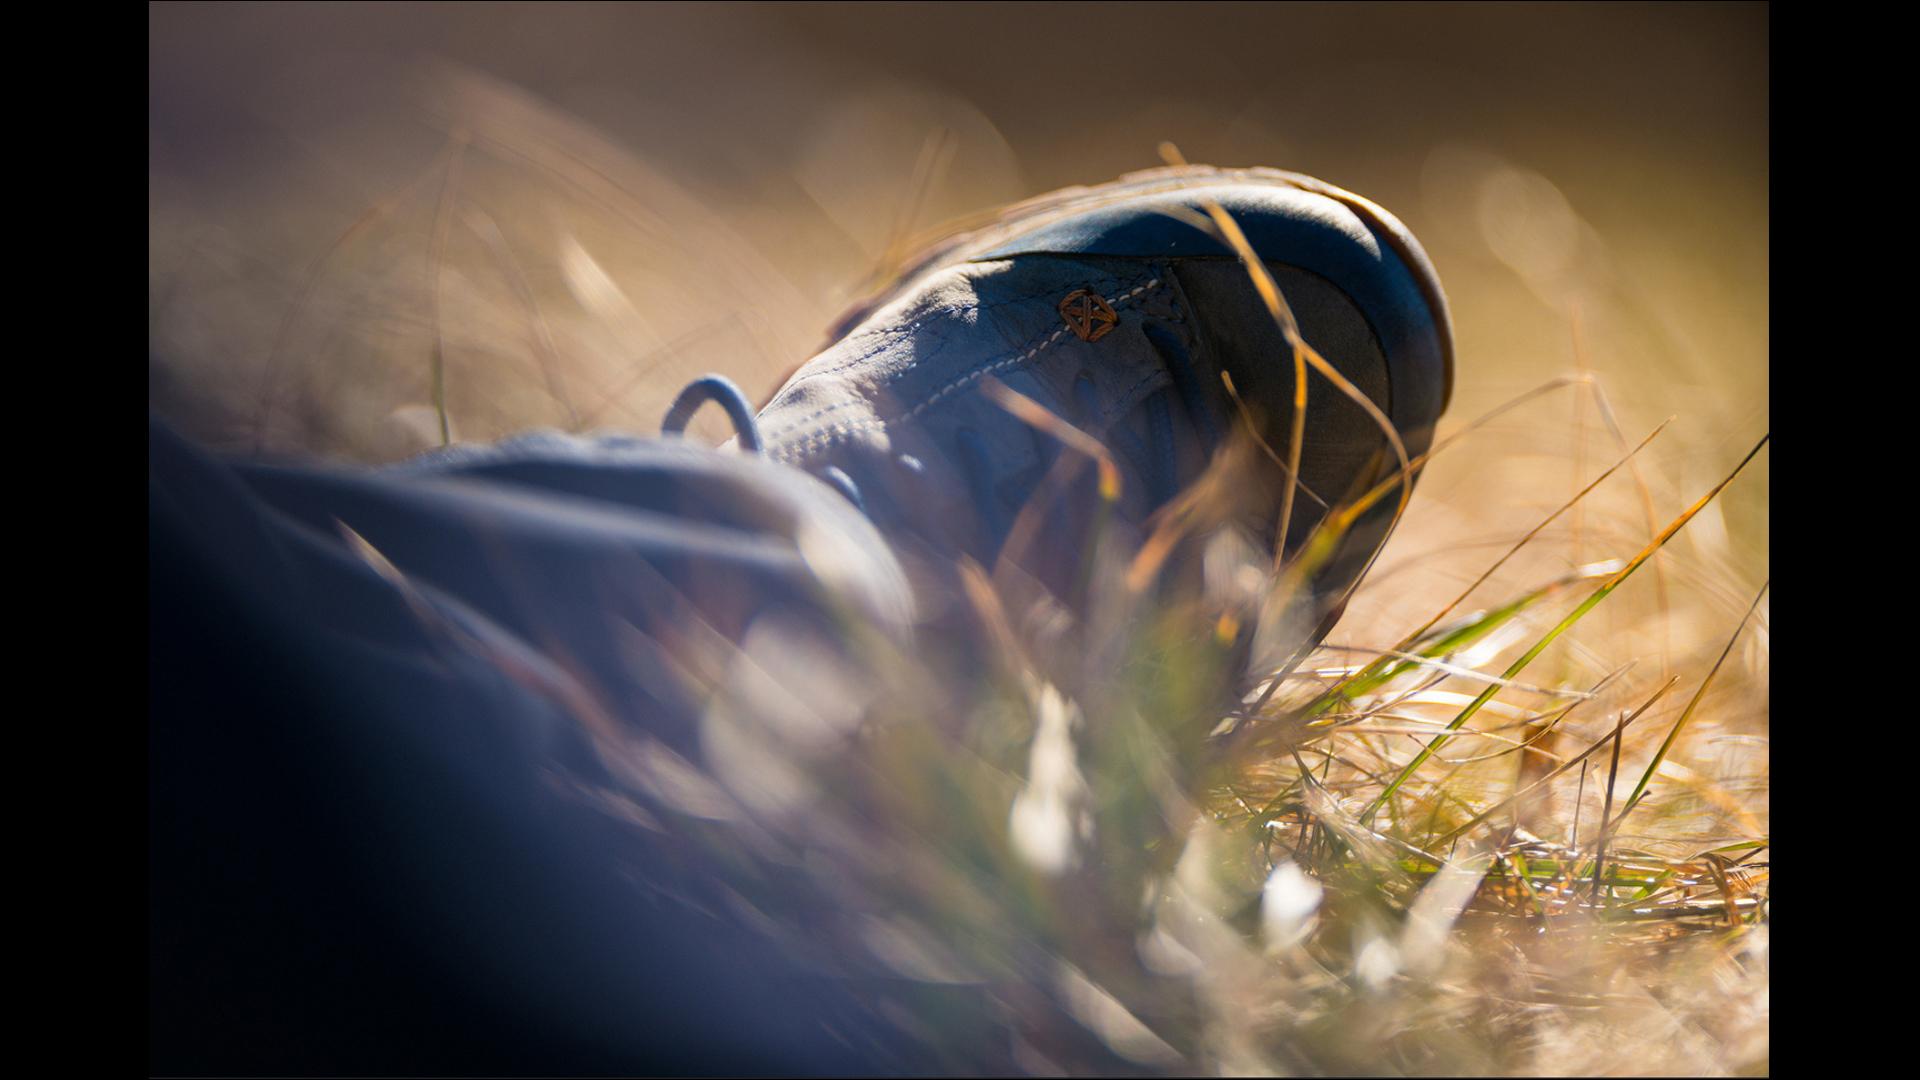 Davide Gabino photographer of the day